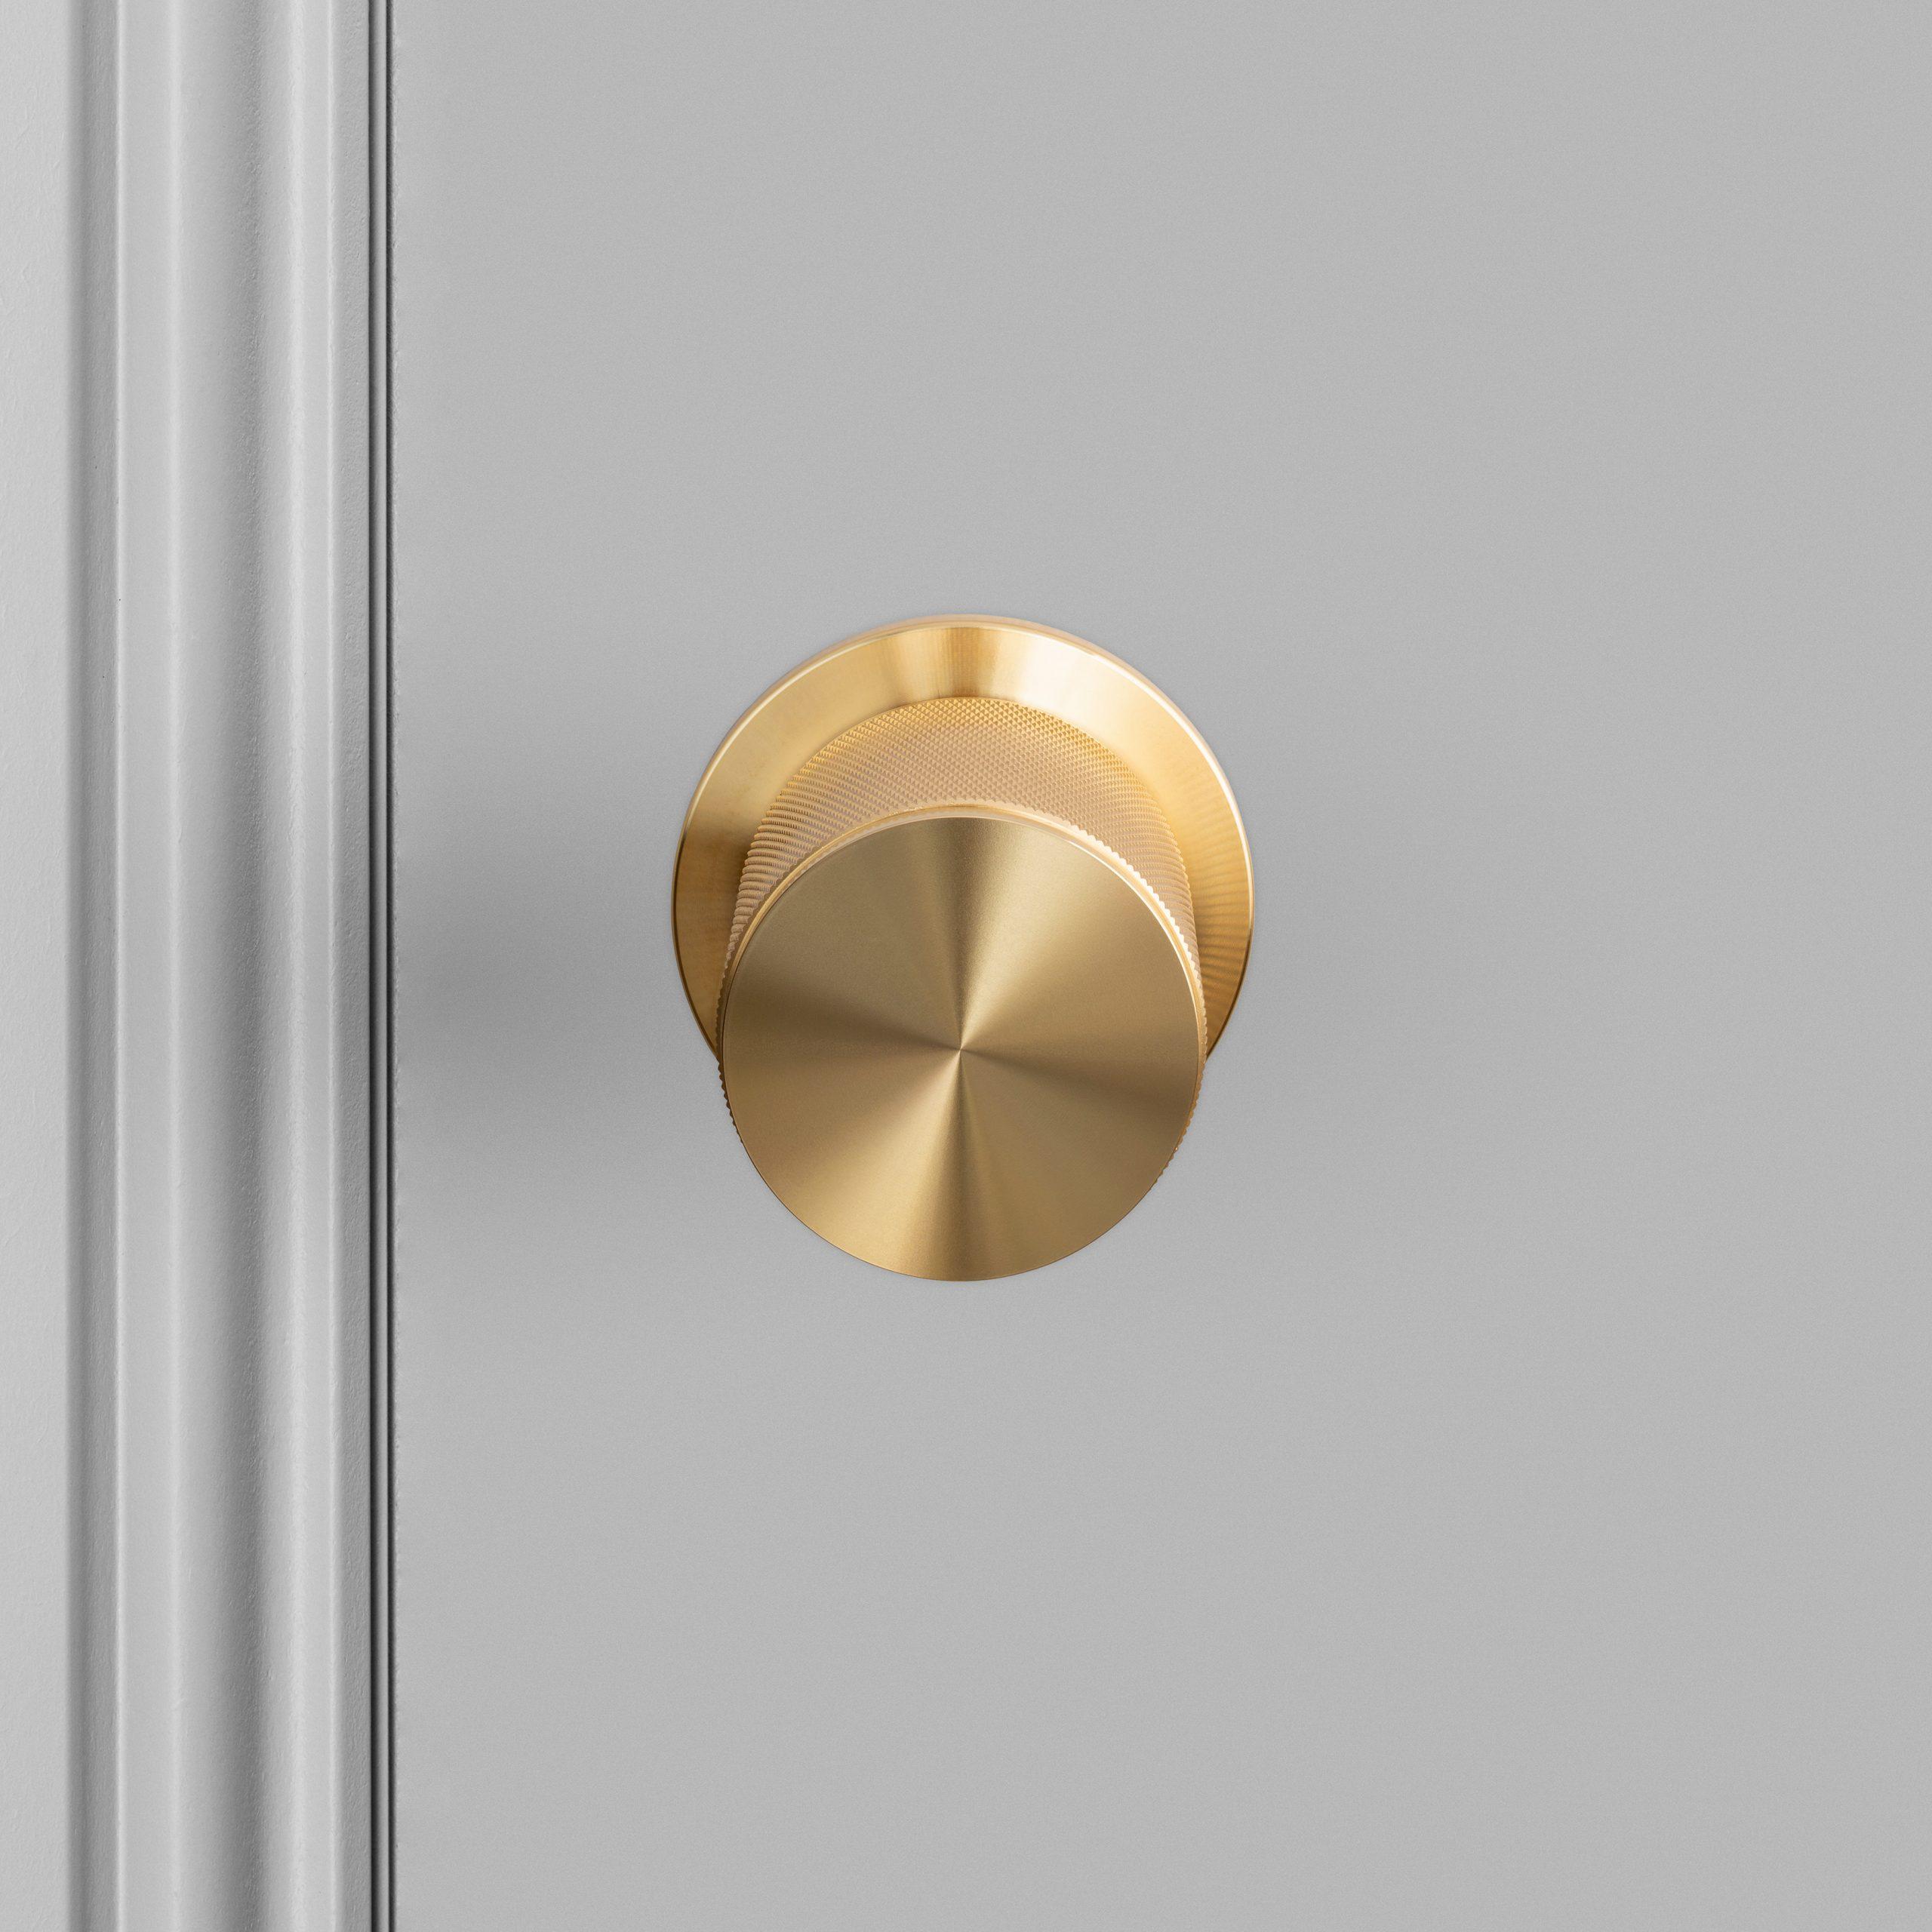 2. Door_Knob_A2_brass_US